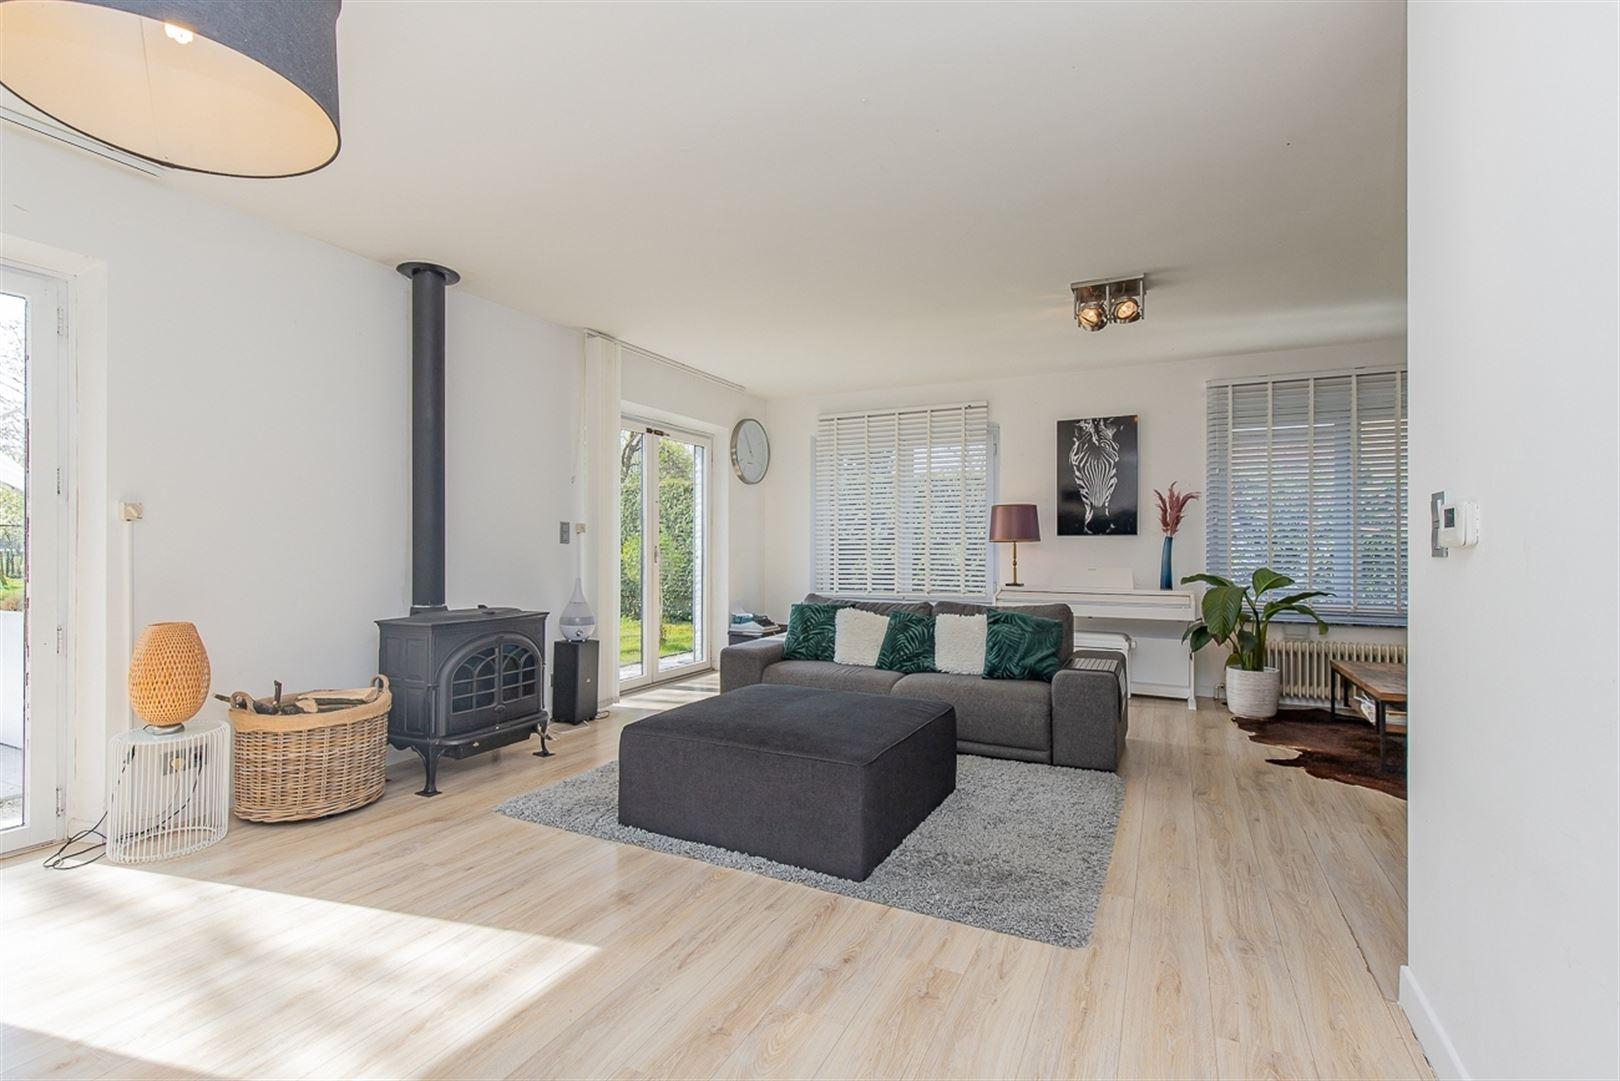 Foto 9 : Villa te 9100 SINT-NIKLAAS (België) - Prijs € 549.000